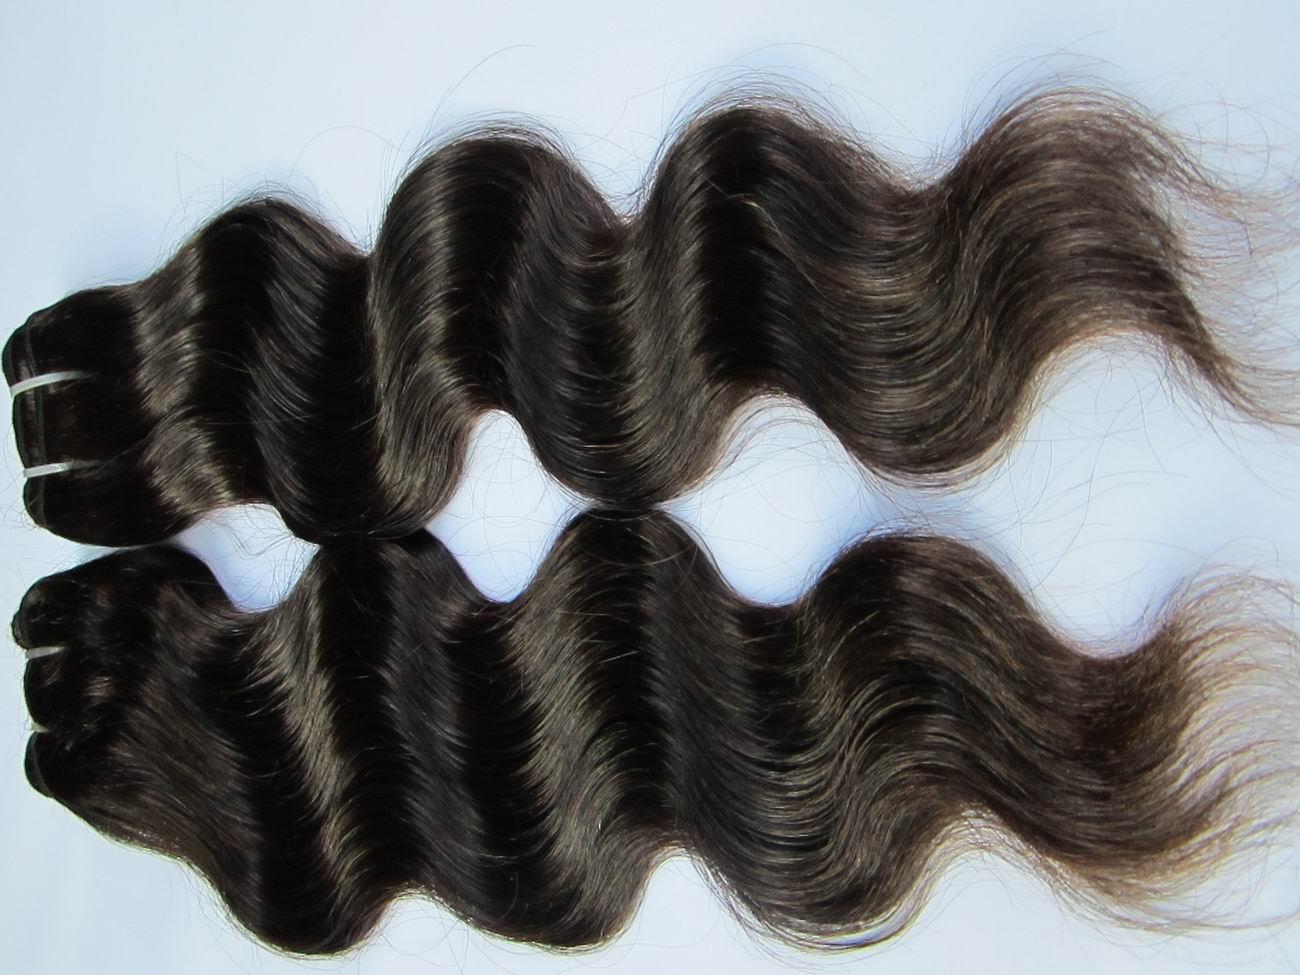 Virgin Brazilian Human Hair Extensions body Wave 12Inch 12OZ 3pks dark Brown